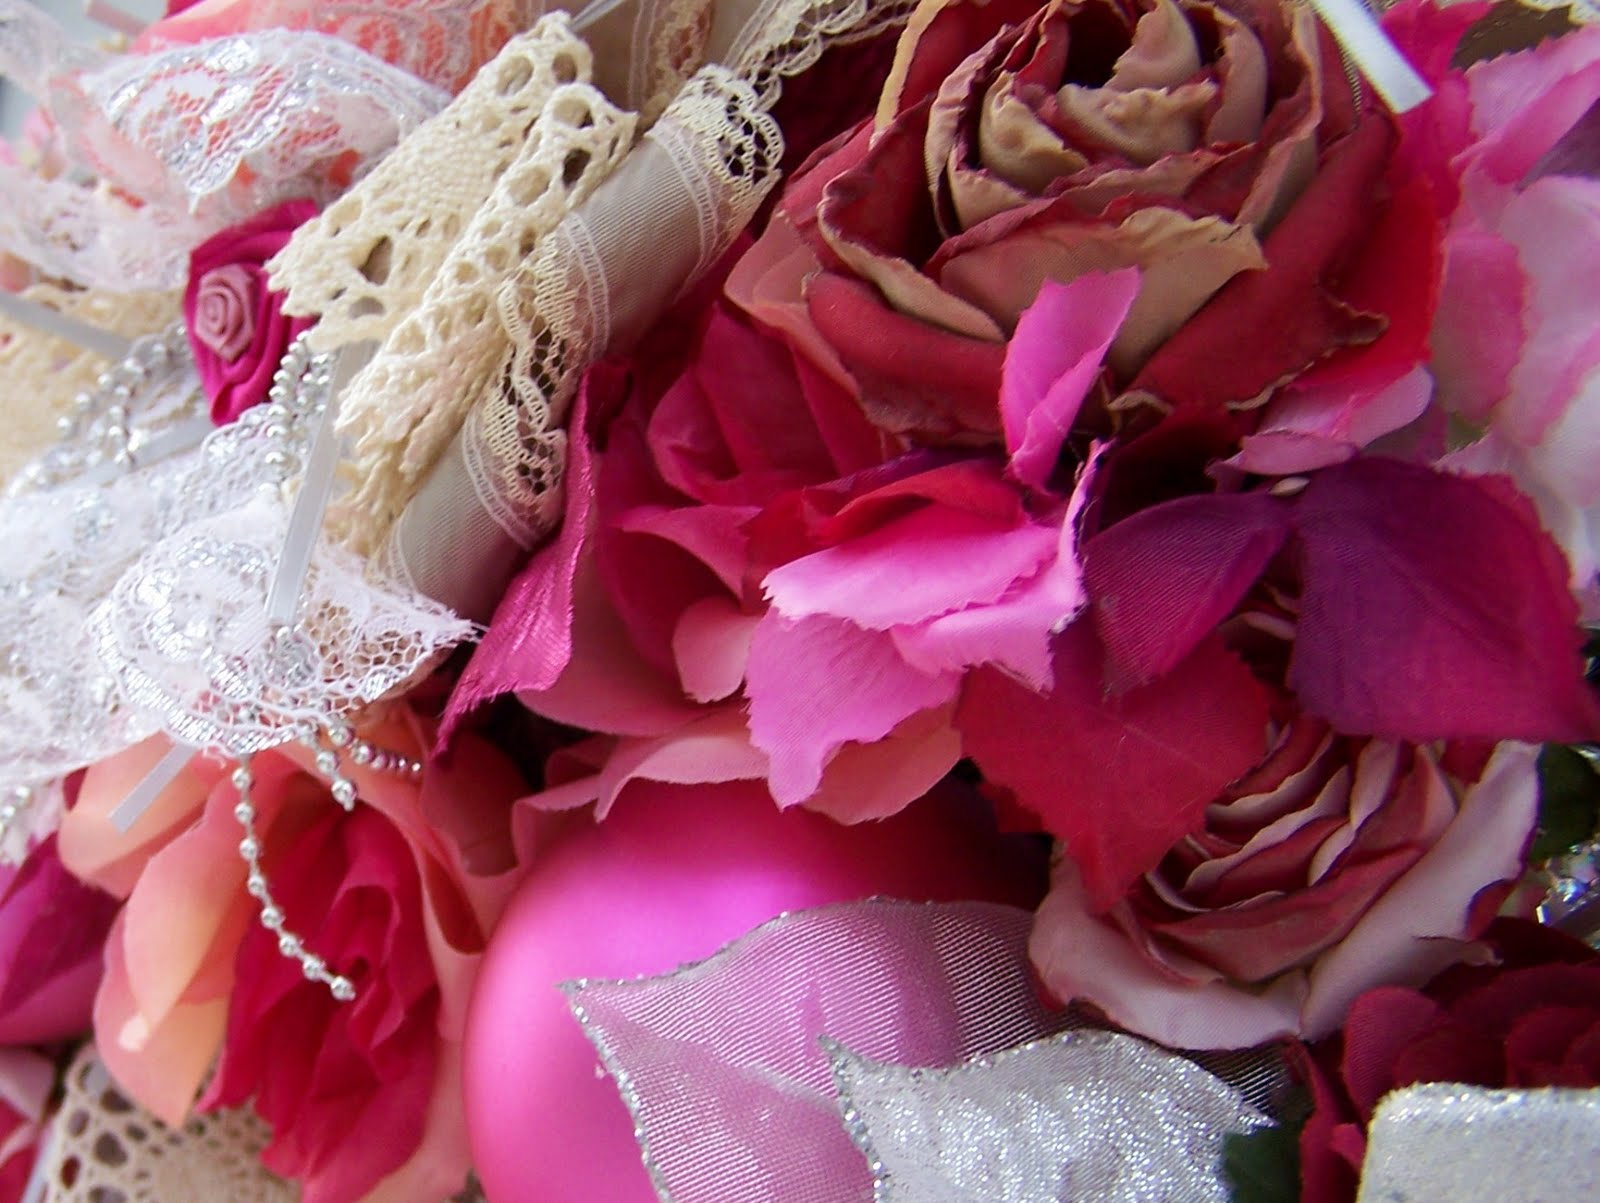 Flower Images 2018 » victorian flower code   Flower Images